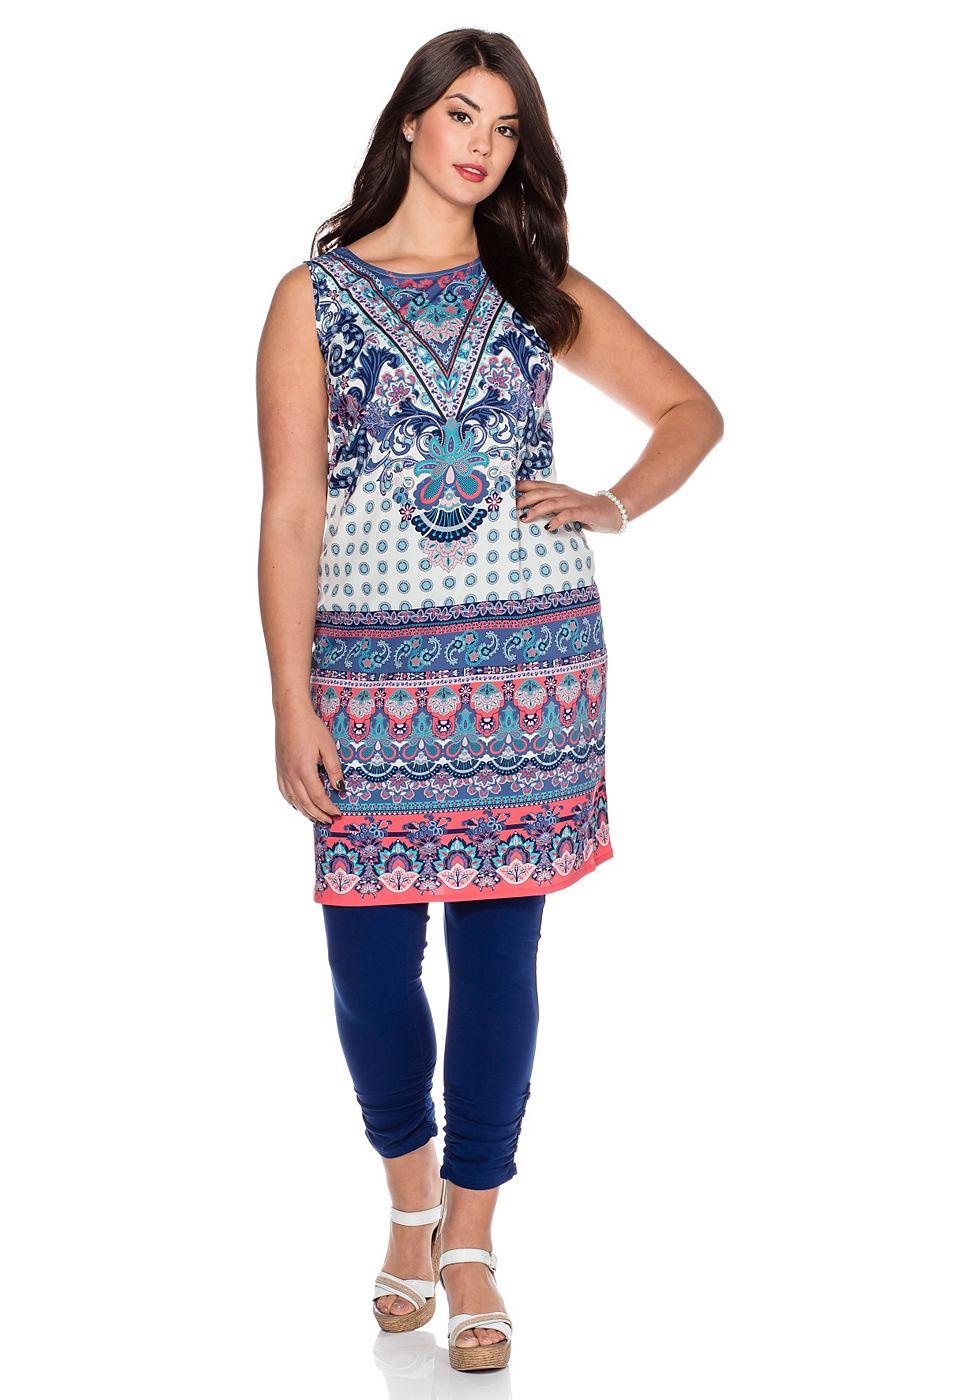 Sheego Style jurk met brede bandjes blauw